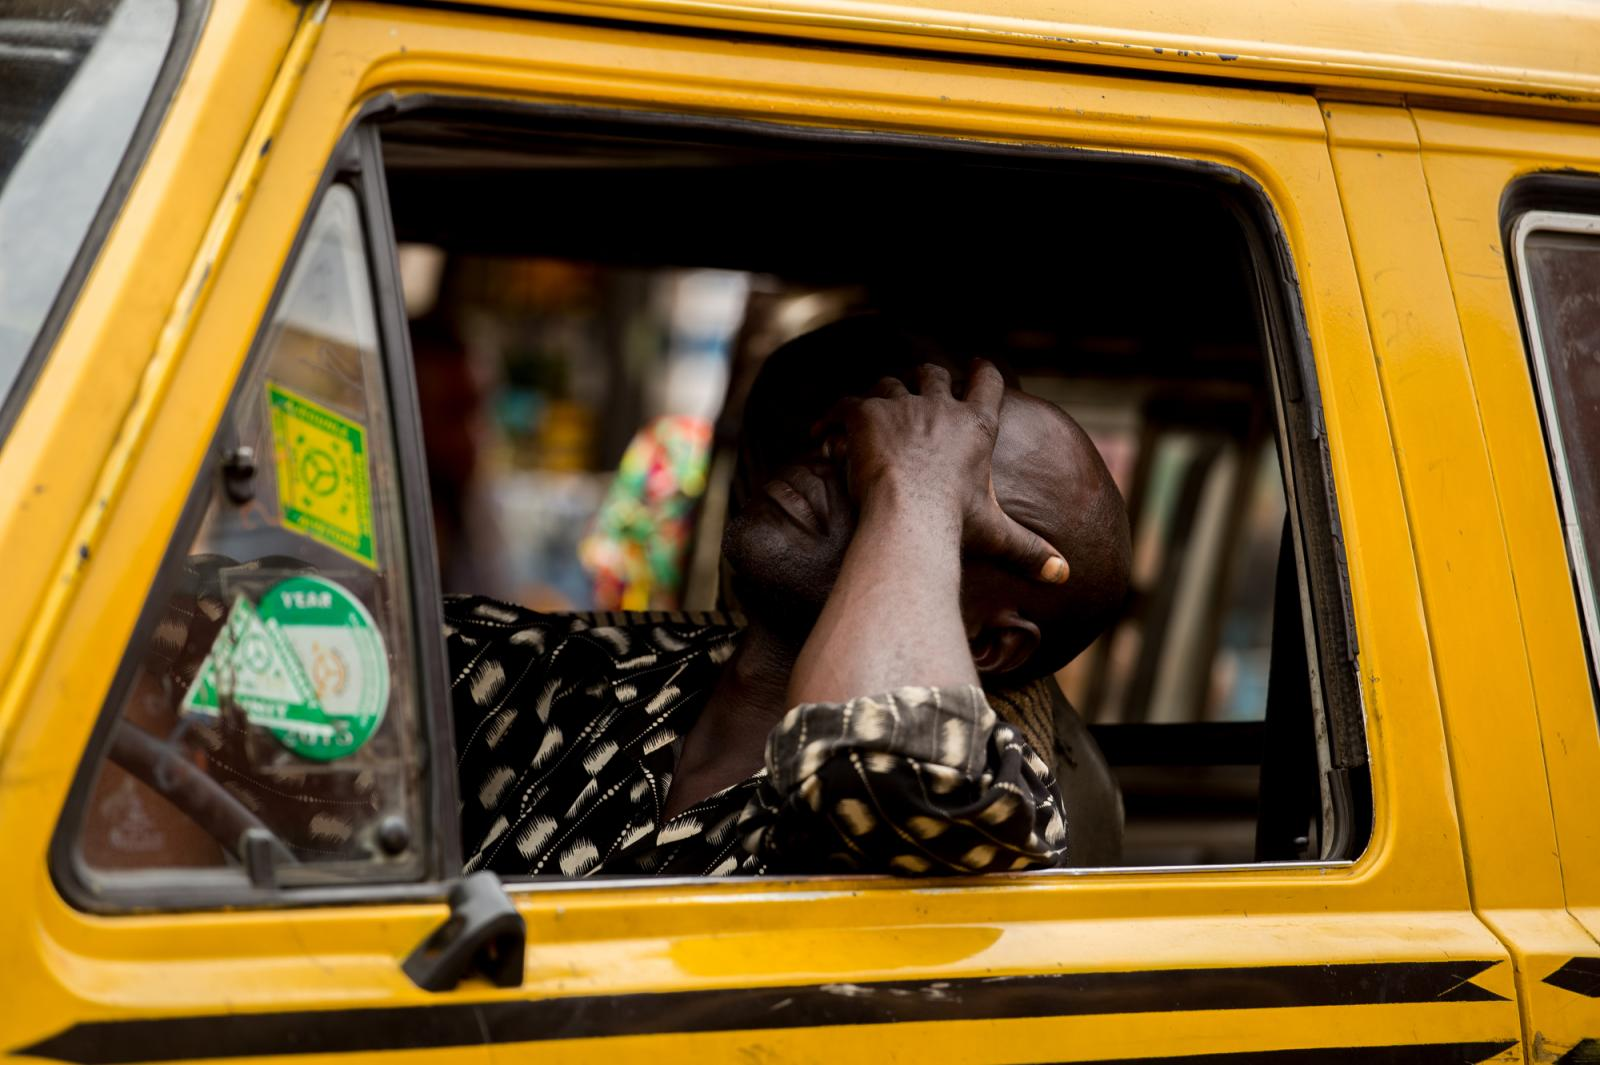 Photography image - Loading Sleeping_On_Duty_Adeyinka_Yusuf_03.JPG